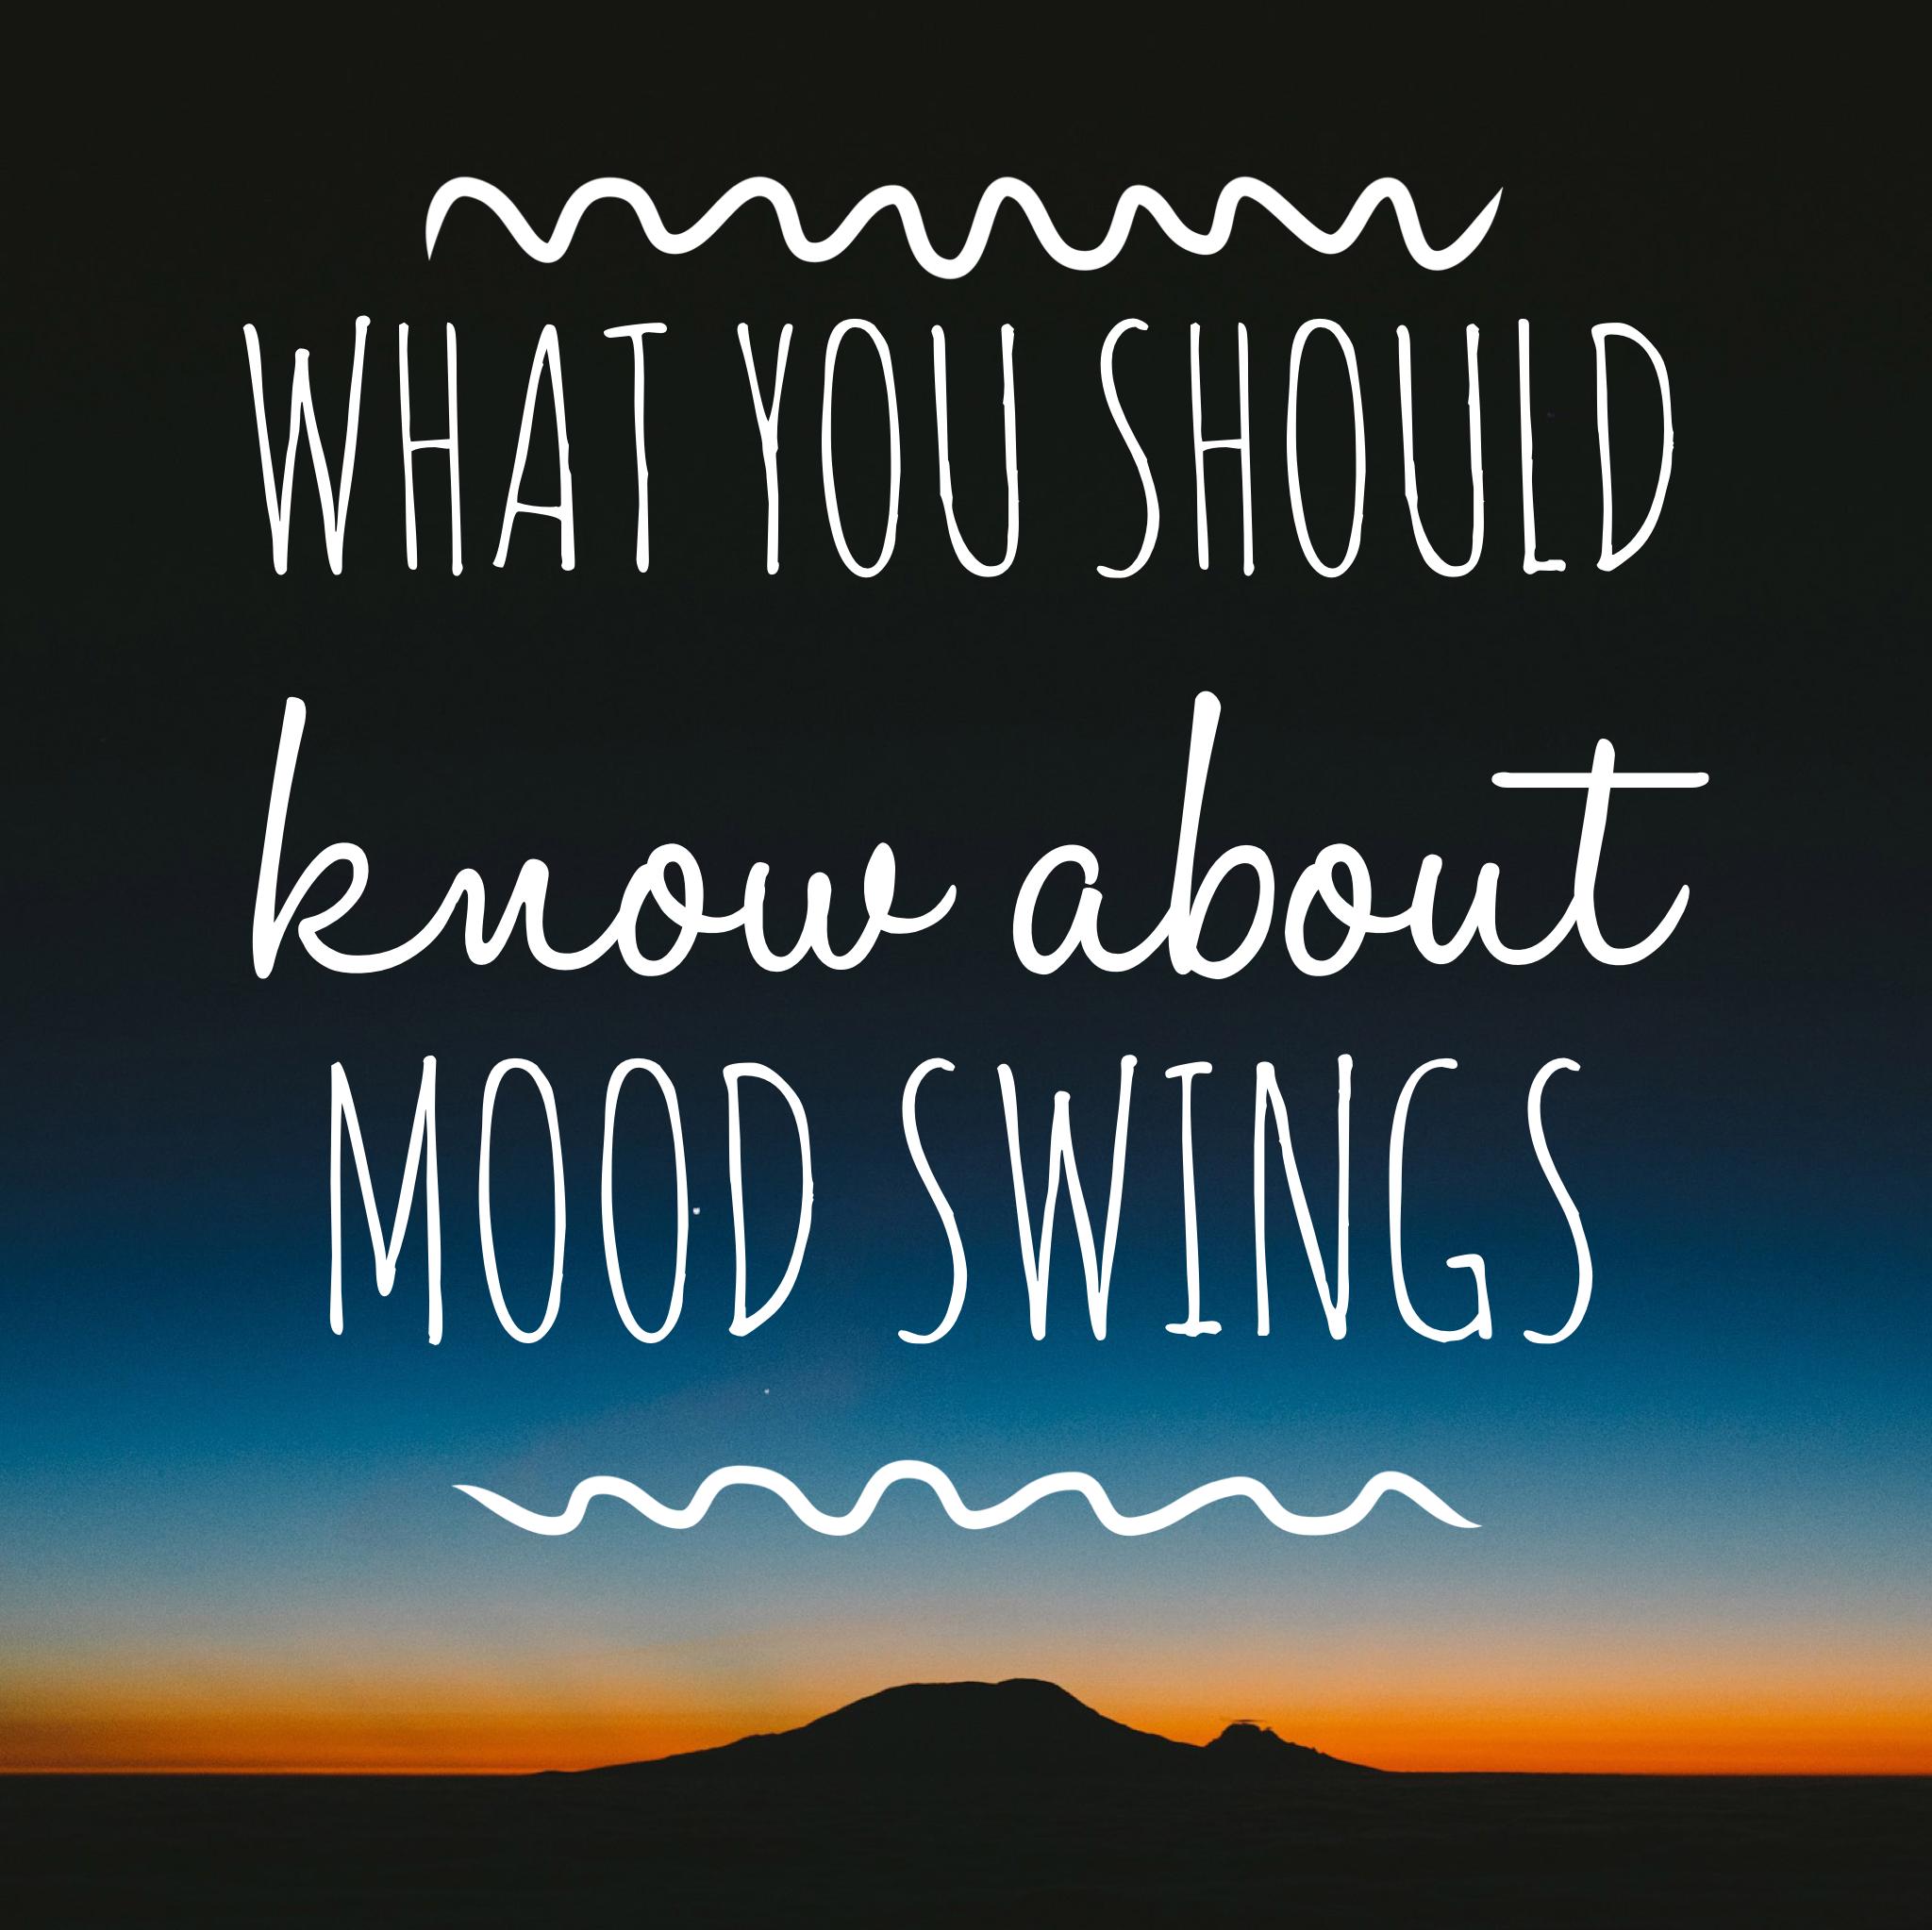 bipolar mood swings therapy